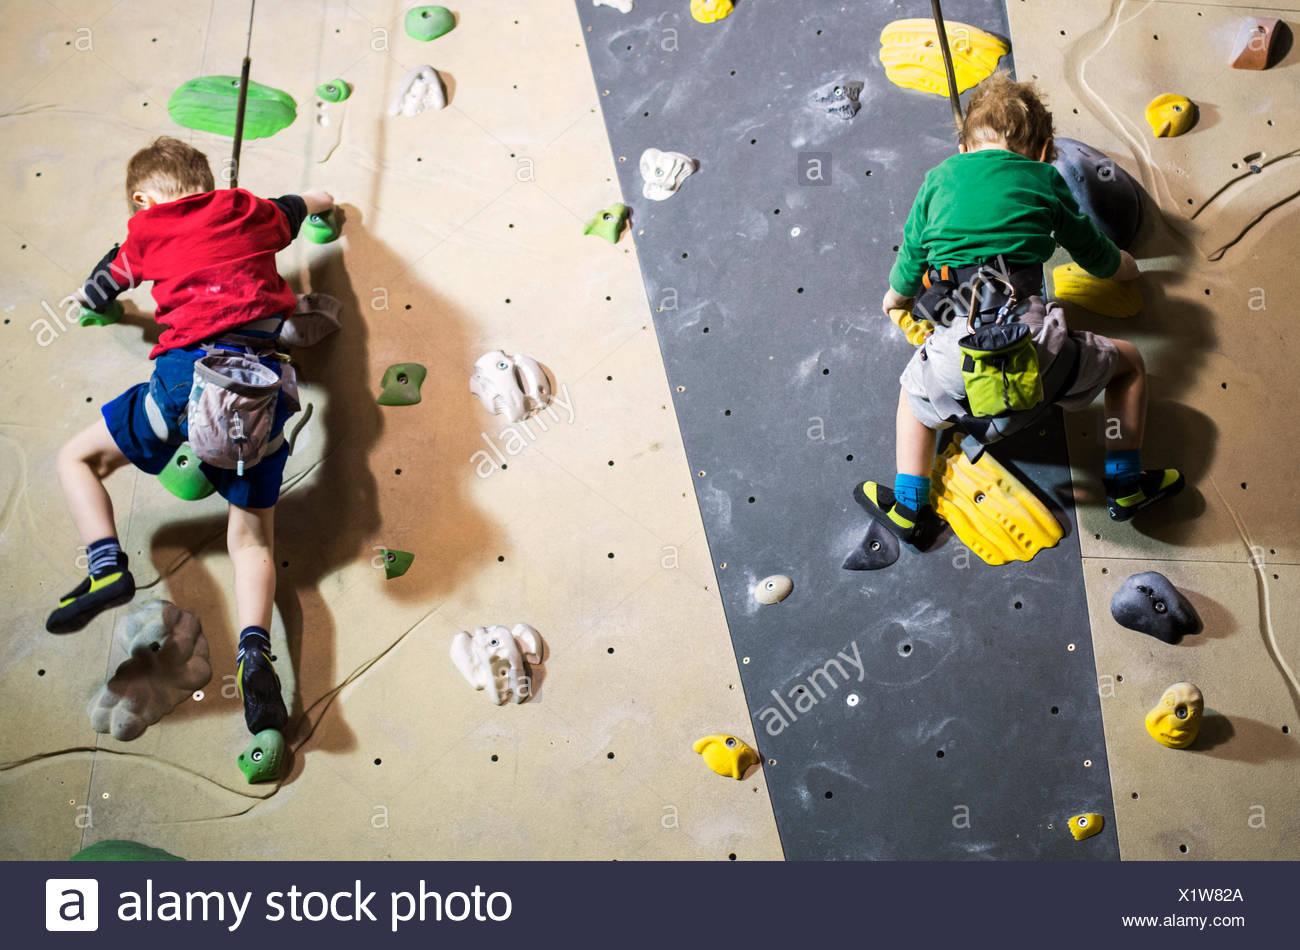 Finland, Helsinki, Boys climbing on wall - Stock Image